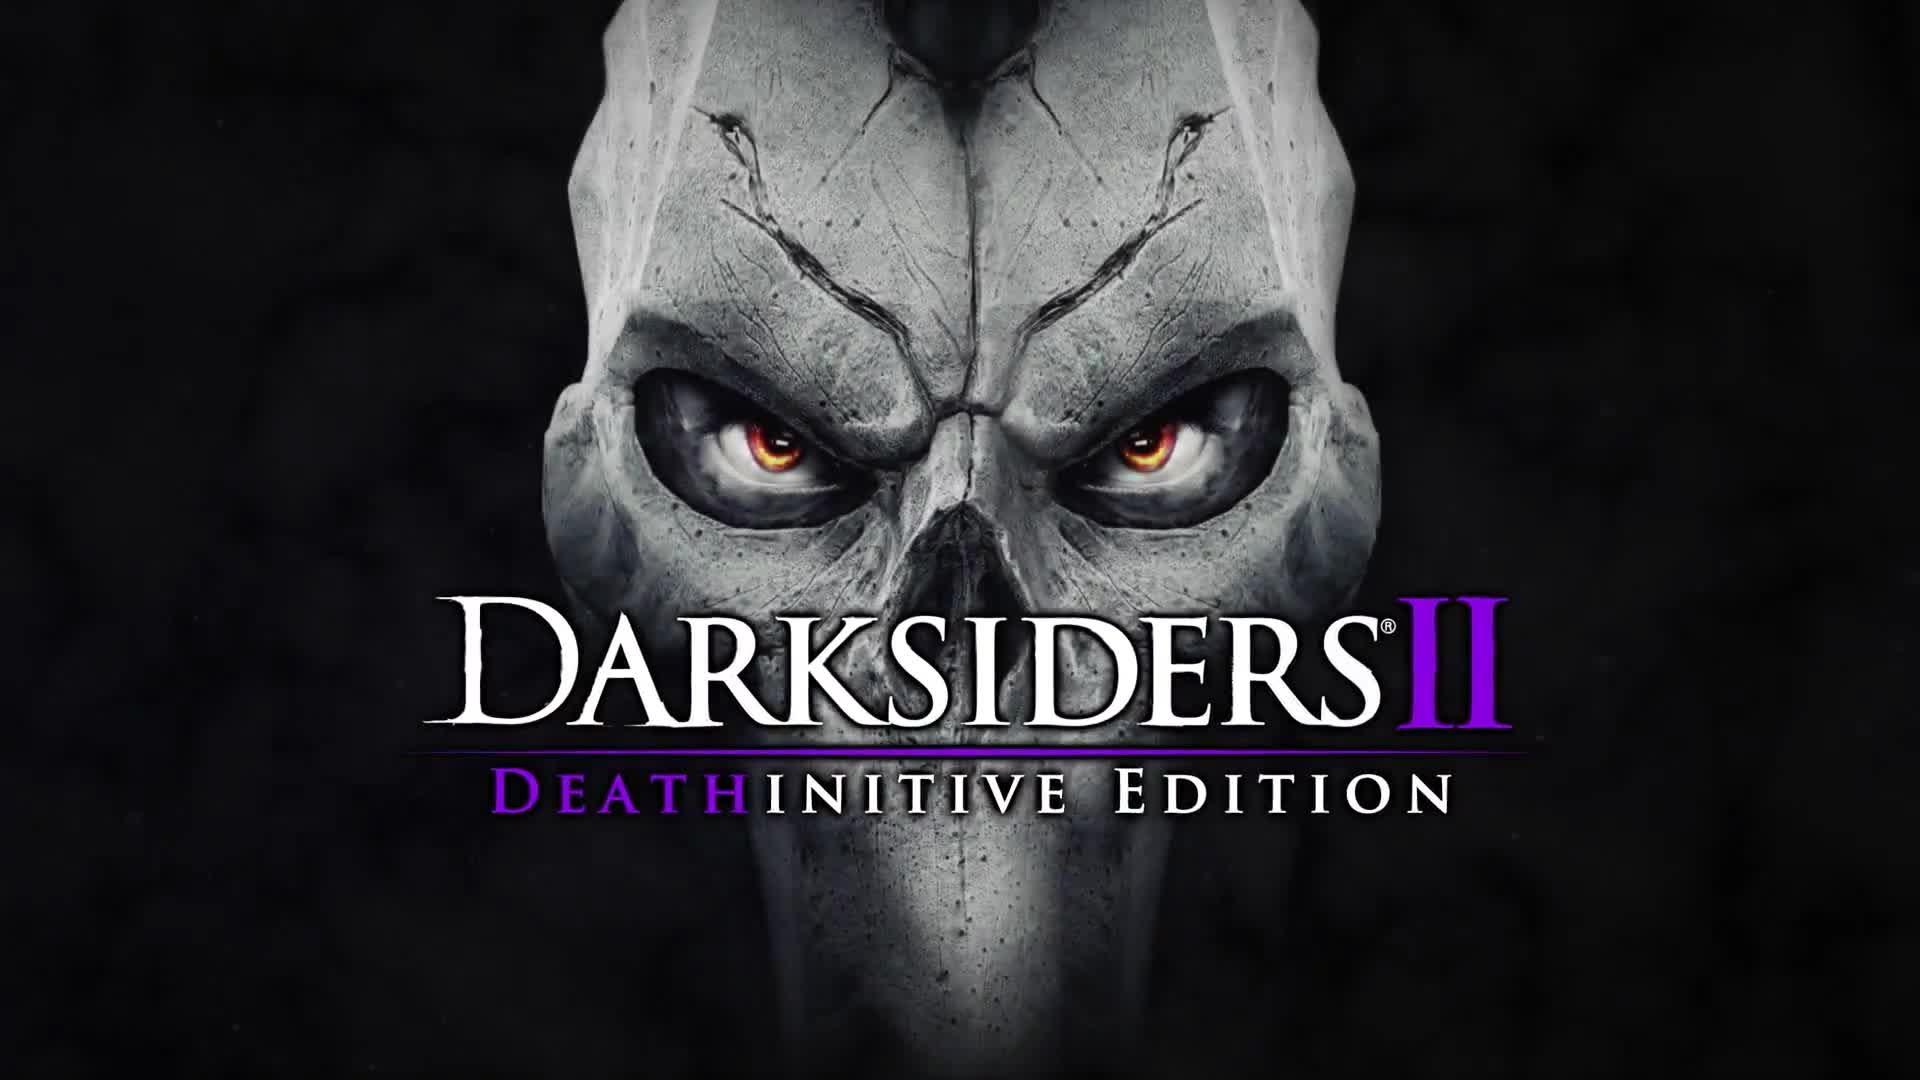 darksiders 2 download in parts